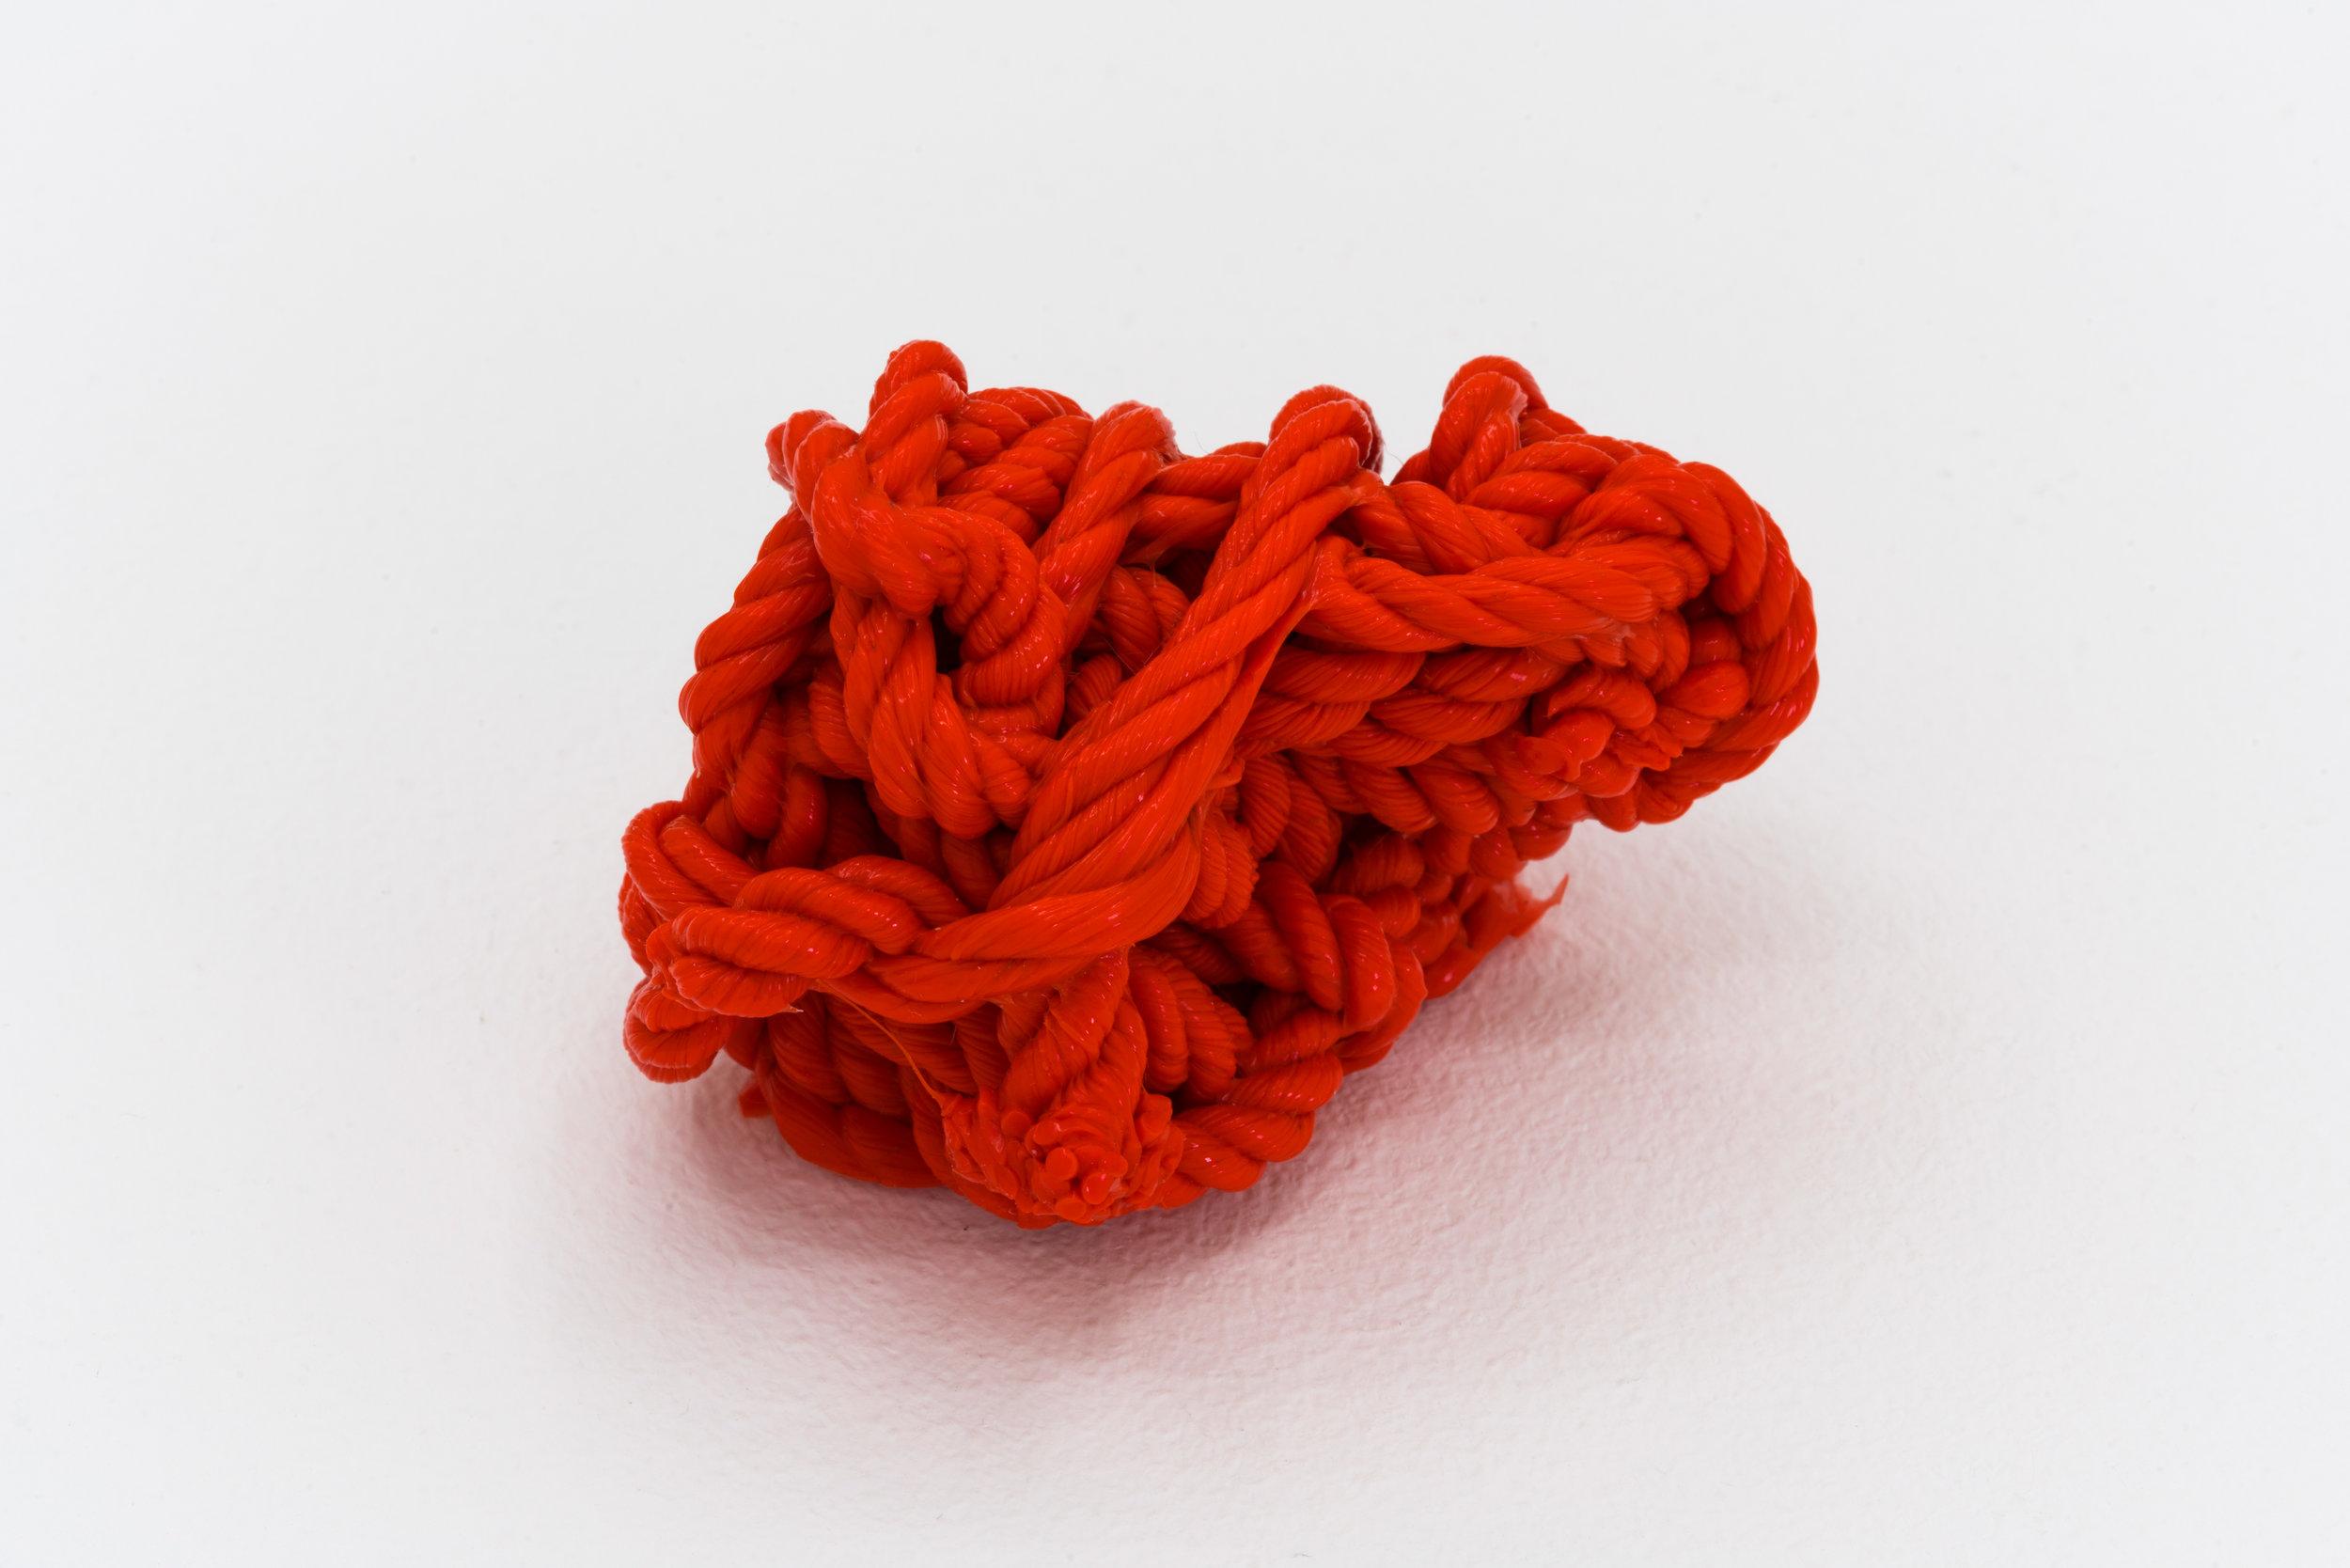 Remko Scha,  Plastic Meltdown , 1962-1992, Plastic, 5 x 7 x 4 cm